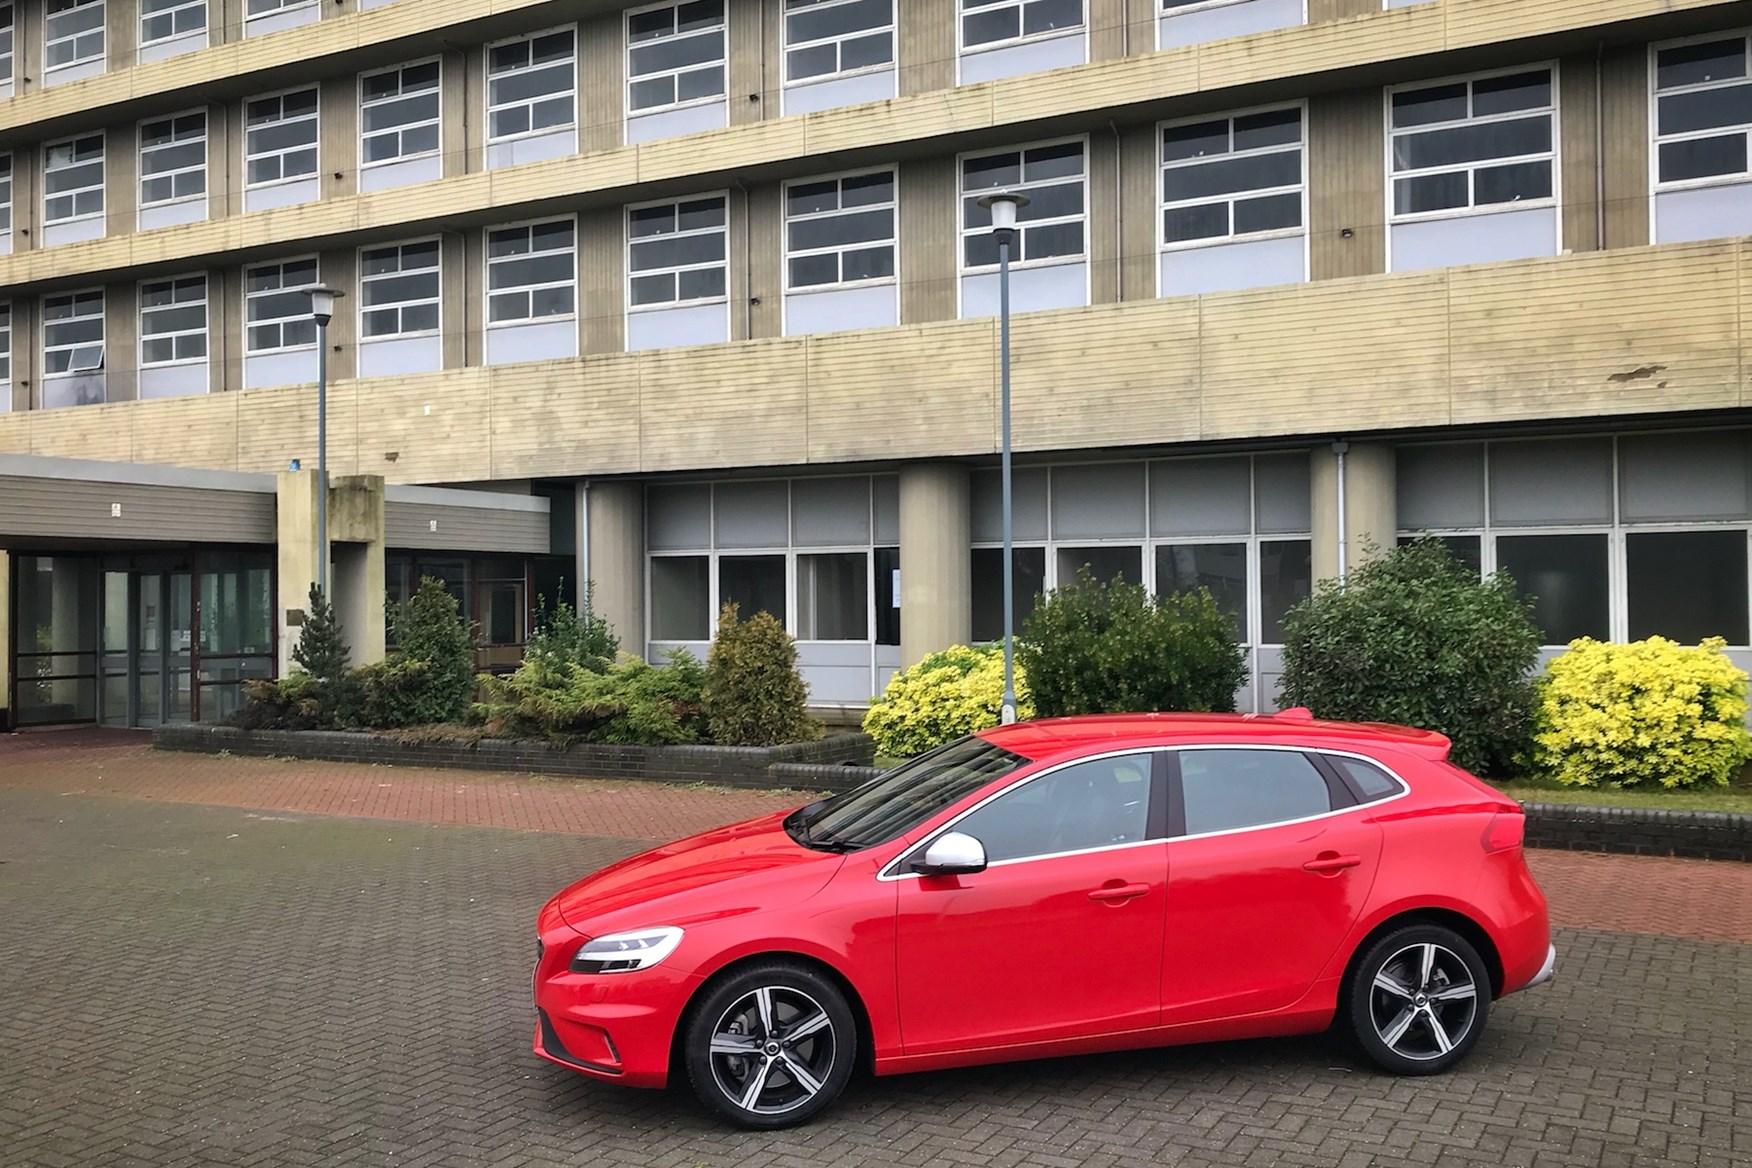 Volvo V40 D4 R-Design in Passion Red